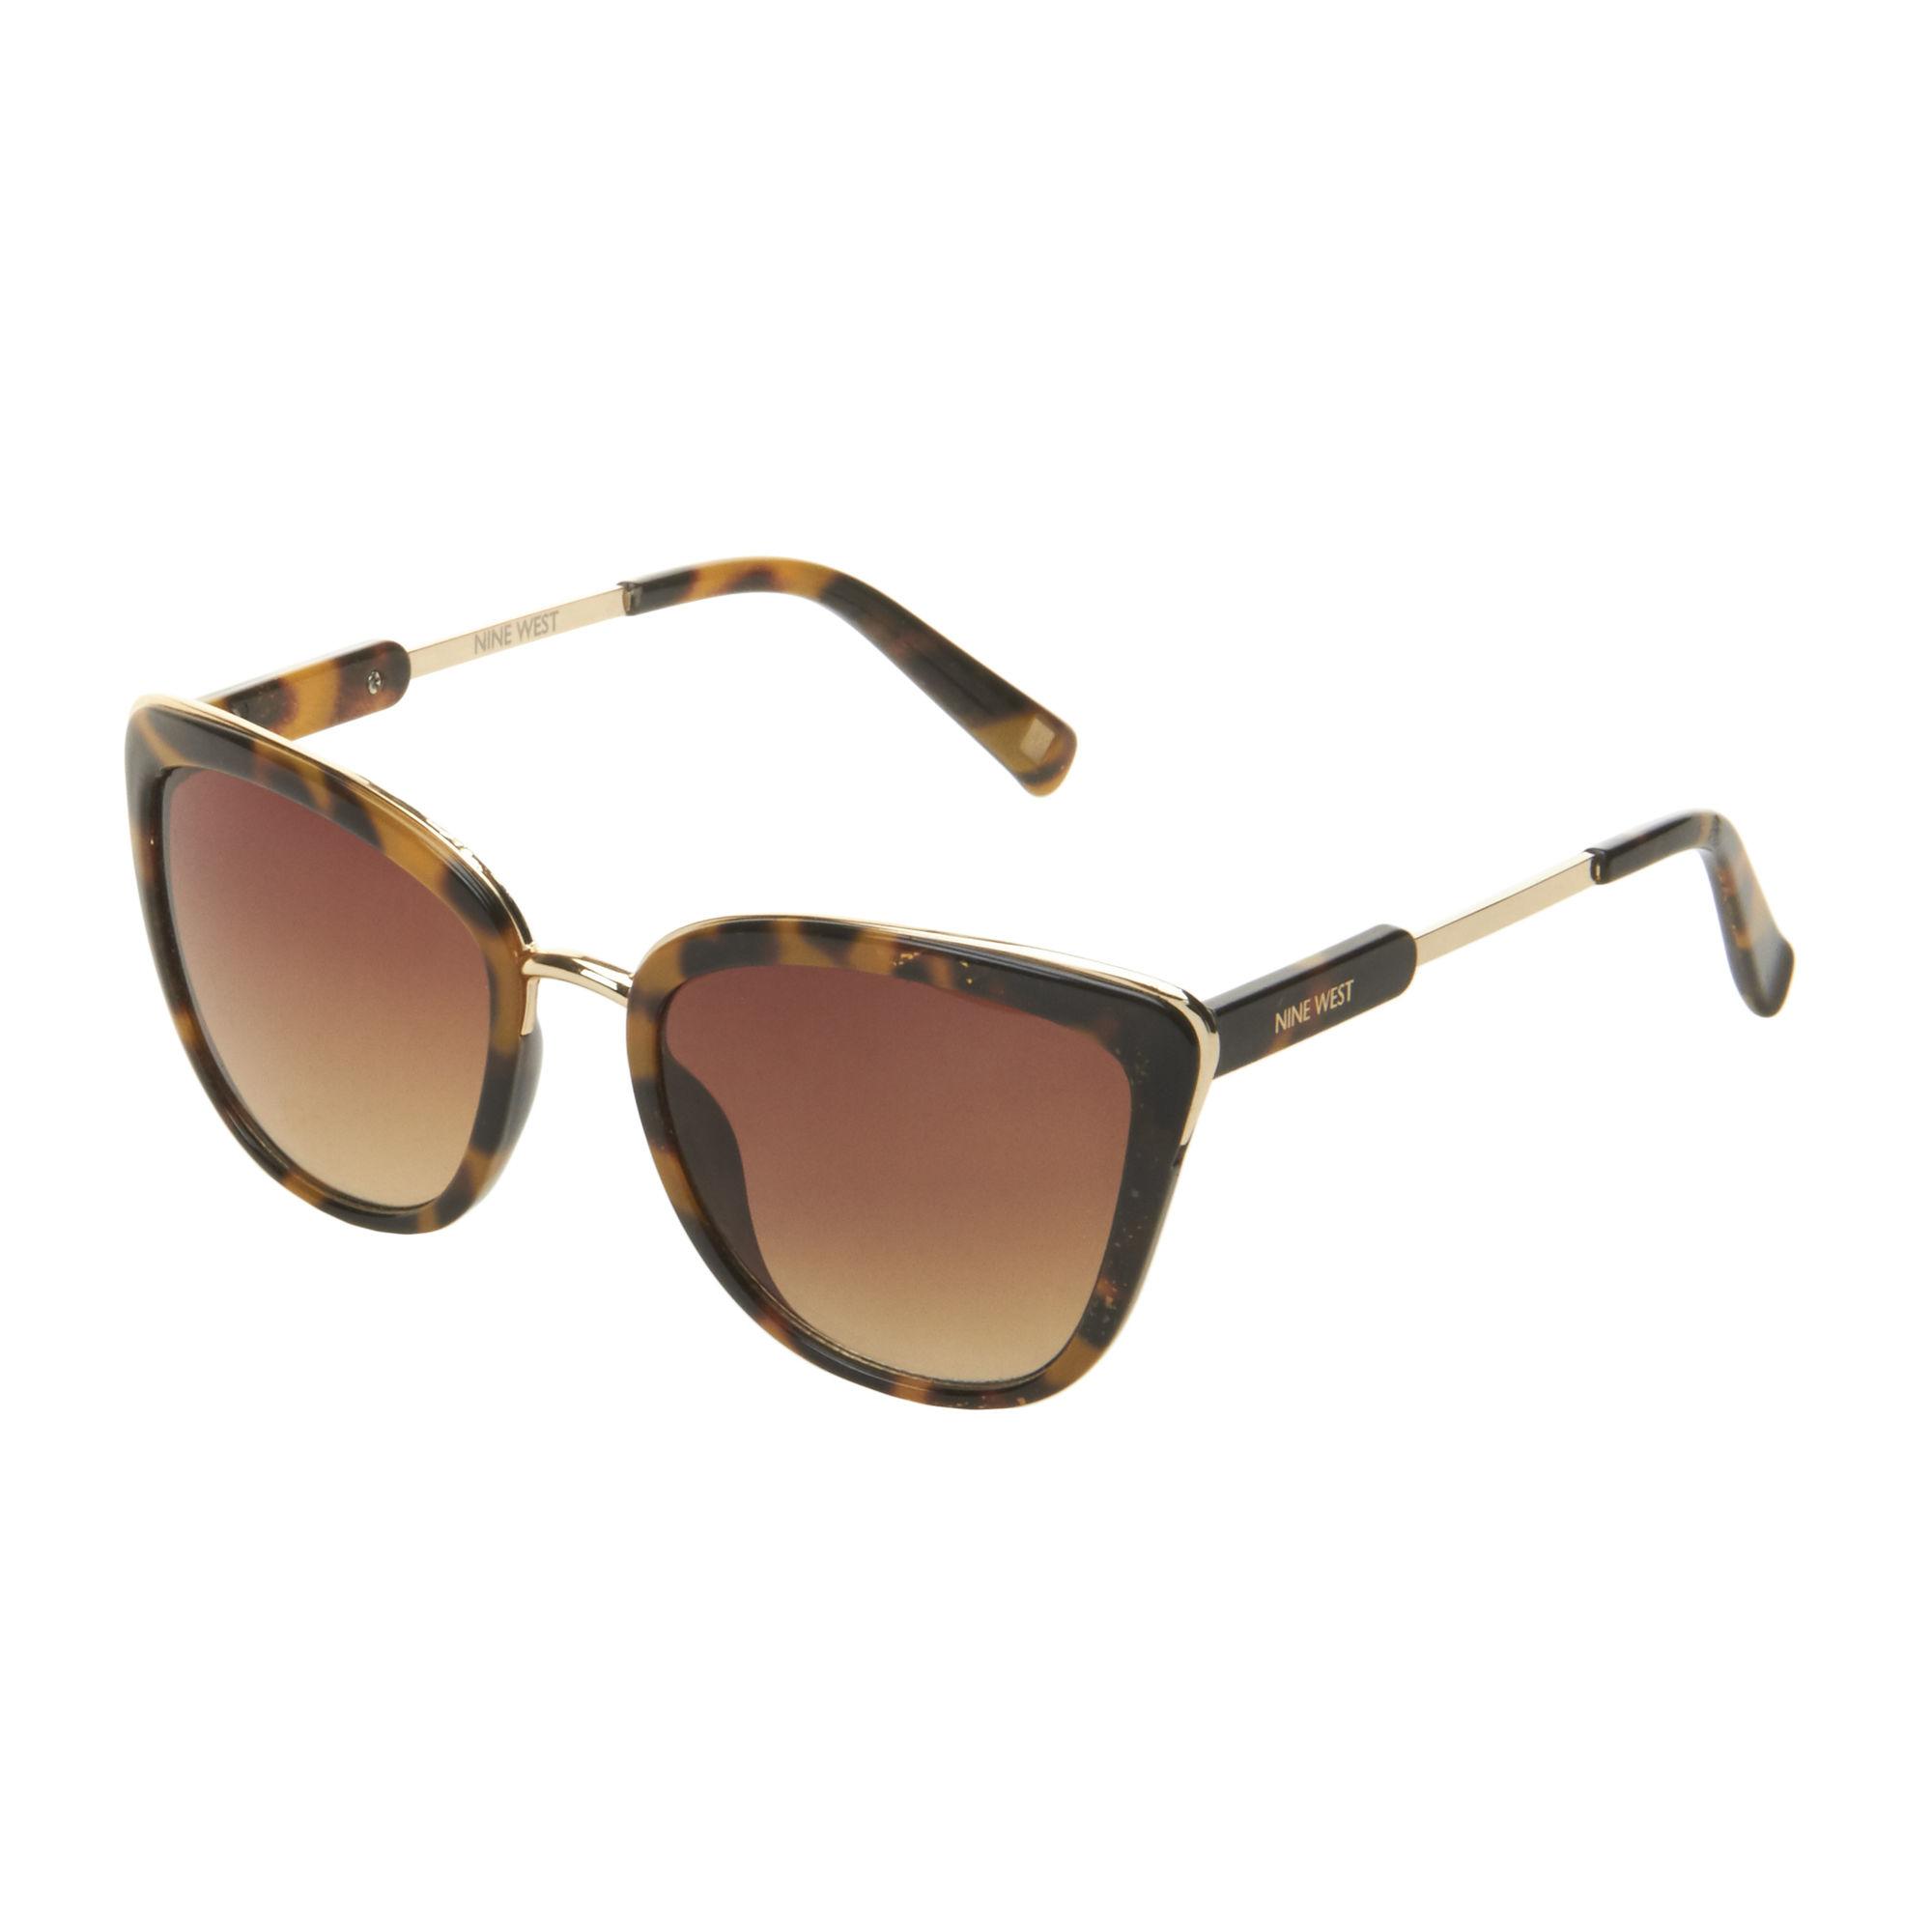 215d8ec34d Nine West Dark Tortoise Cat Eye Sunglasses - Lyst